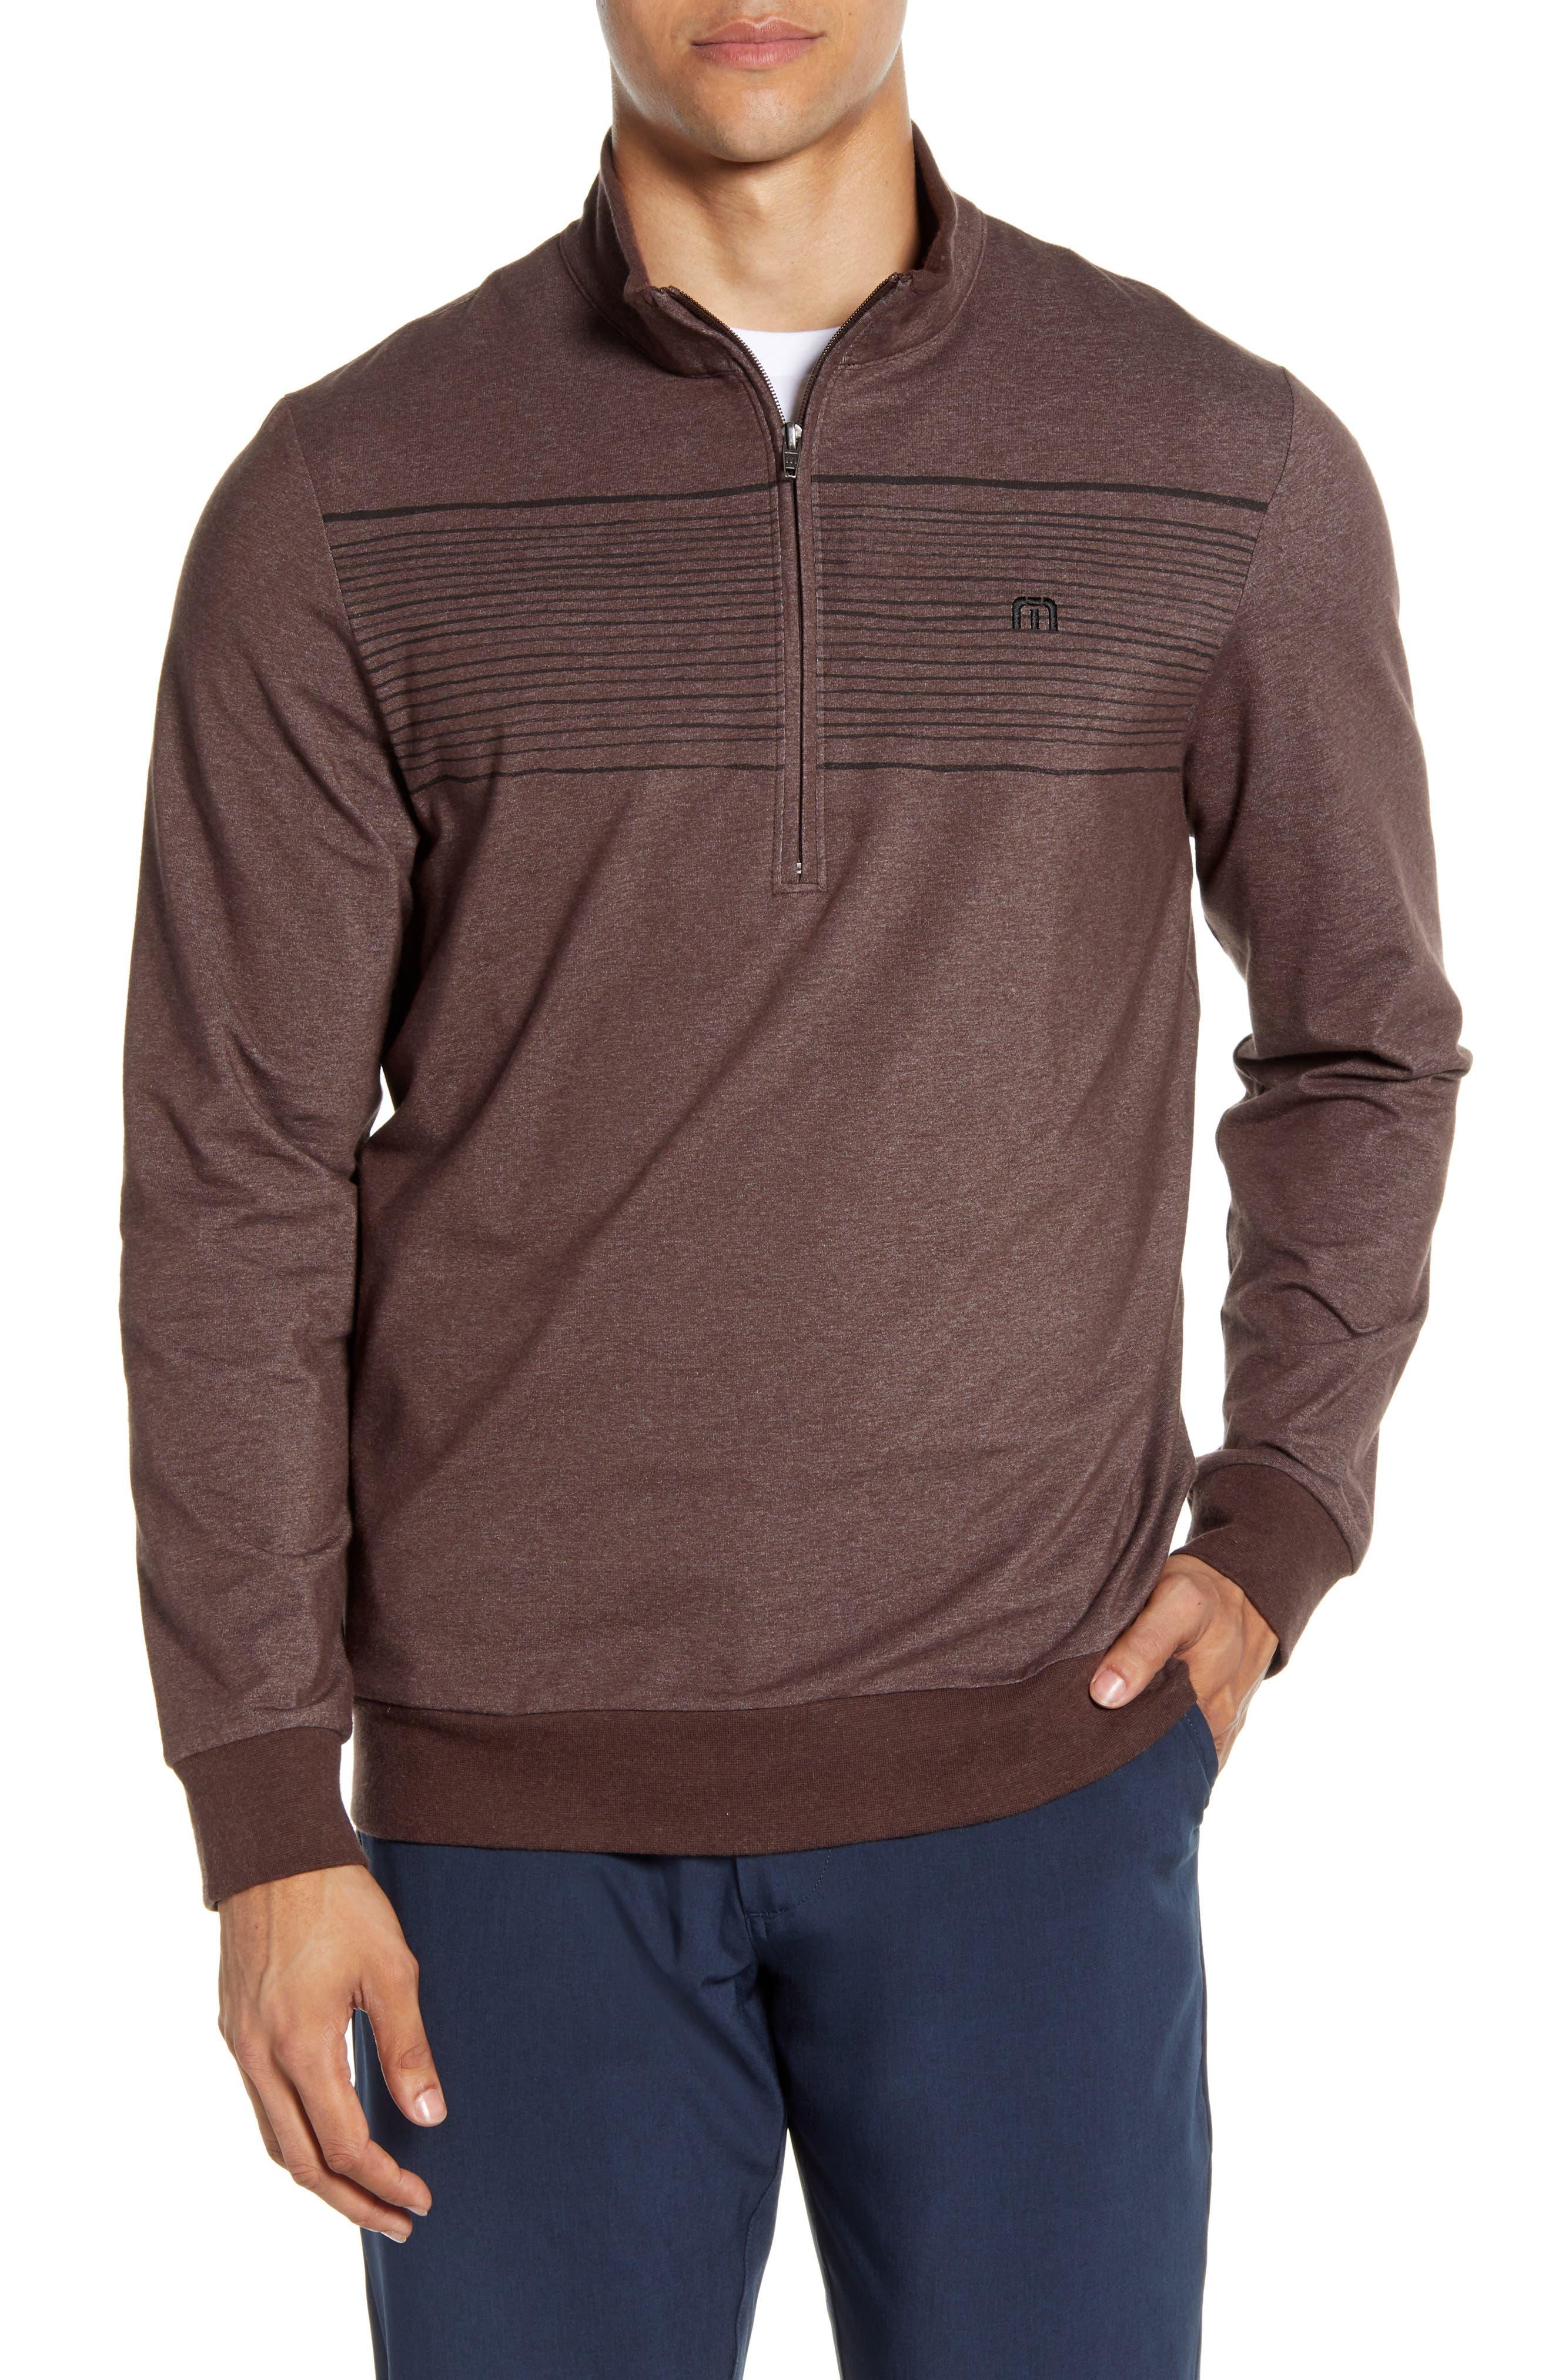 Image of TRAVIS MATHEW Smoke Signals Half Zip Sweatshirt